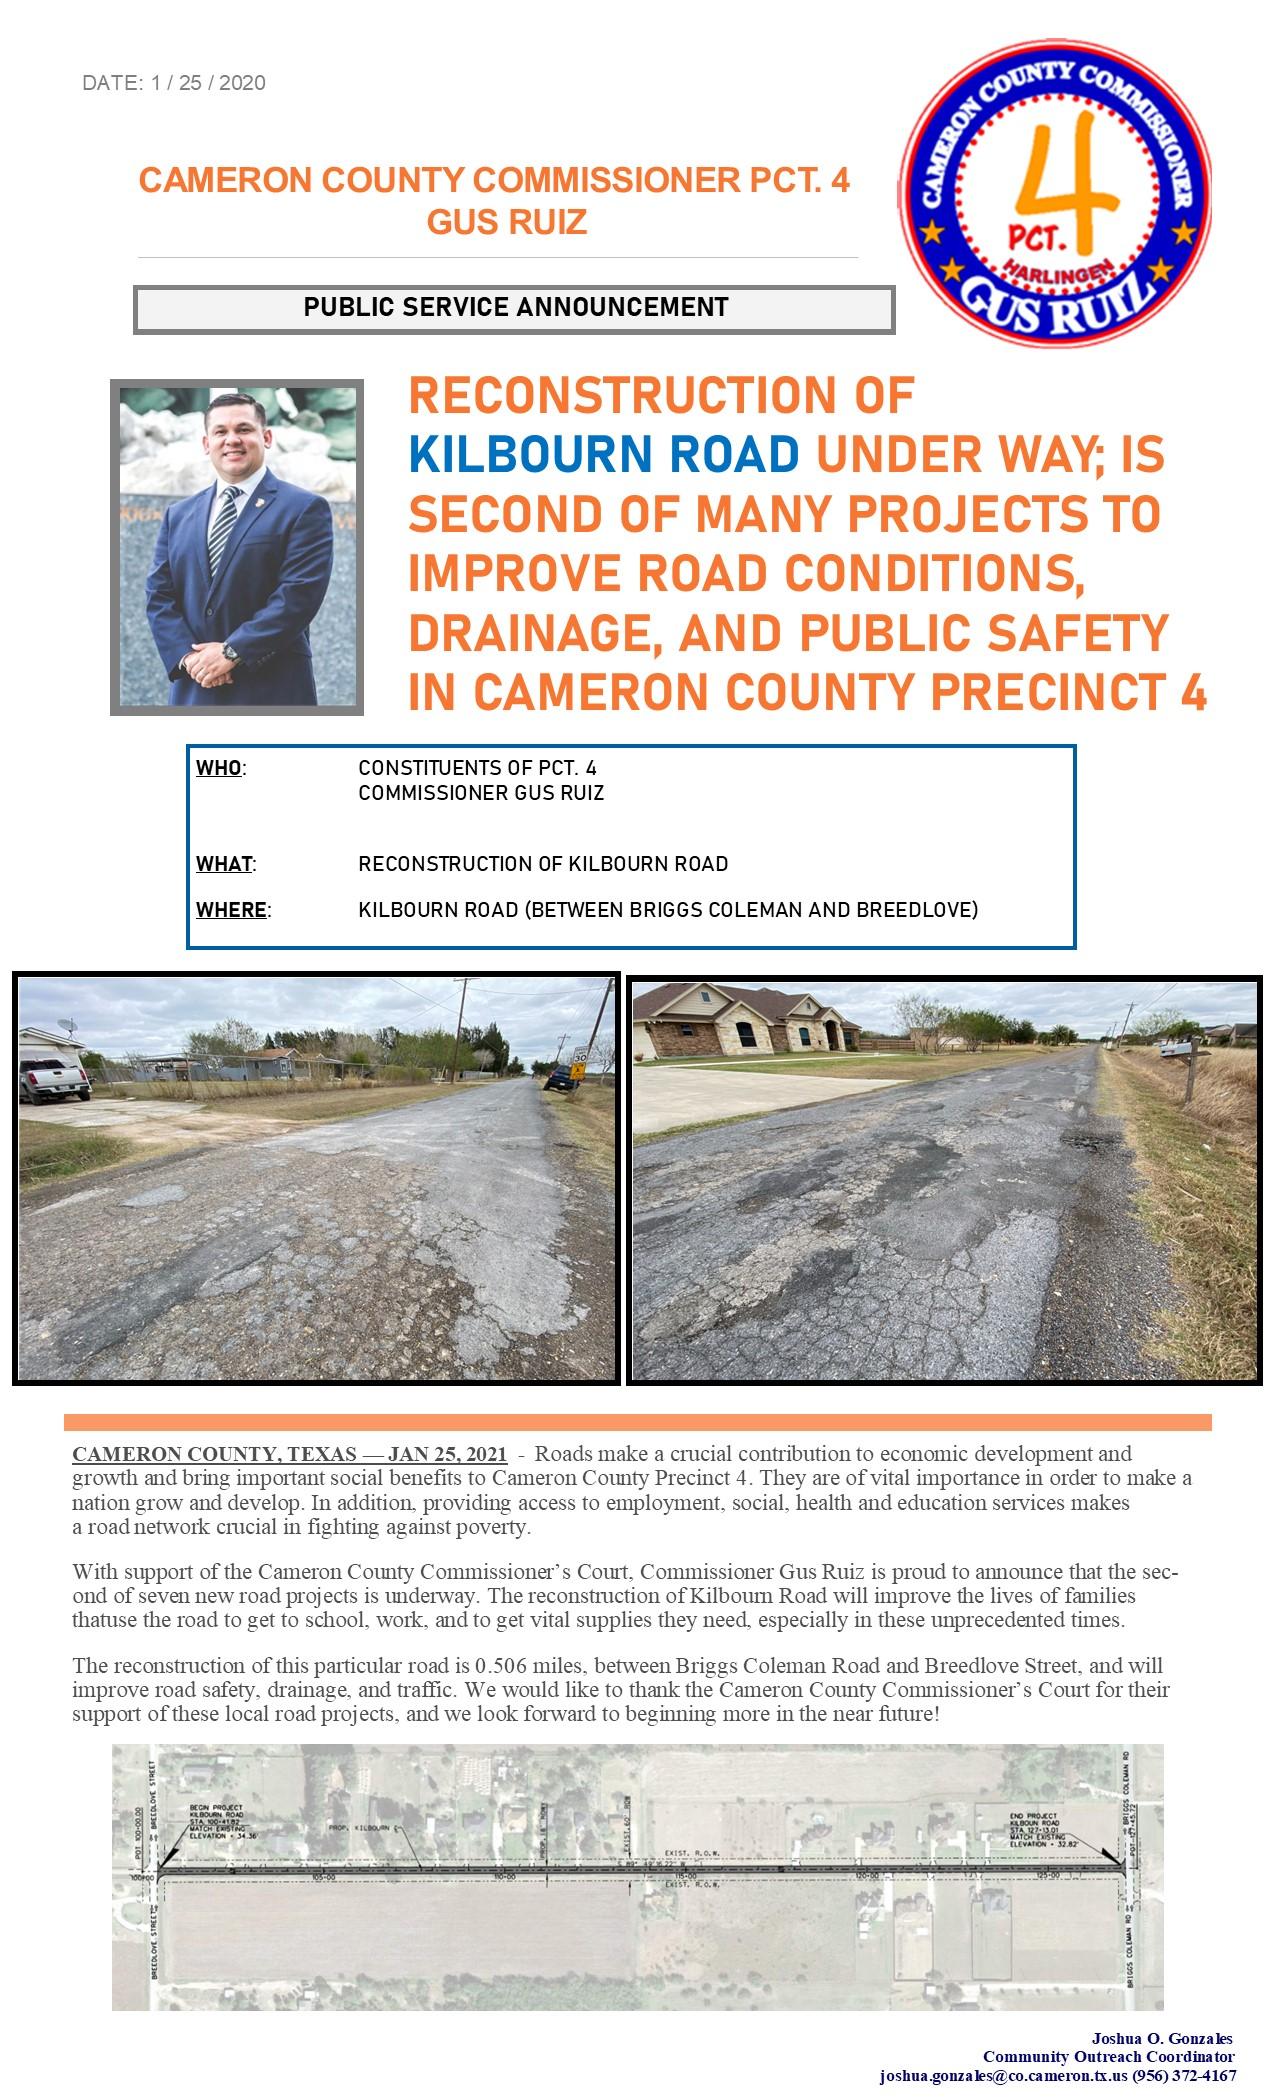 Pct. 4 Reconstruction of Kilbourn Road